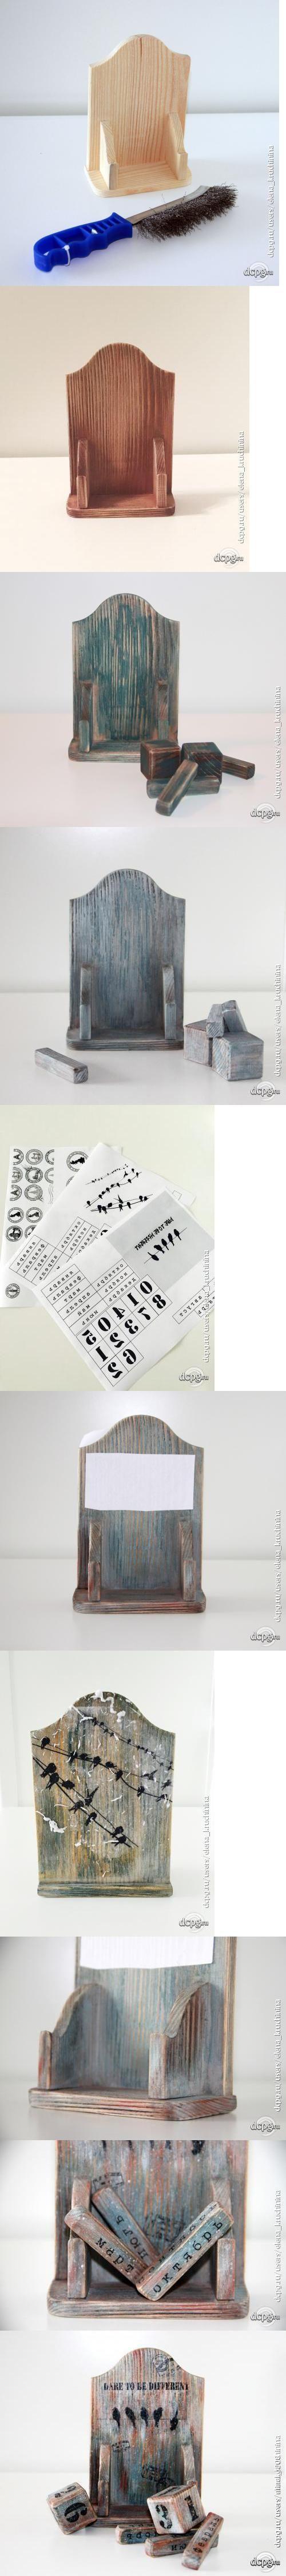 "Декупаж - Сайт любителей декупажа - DCPG.RU | Мастер-класс ""Календарь в стиле лофт"""